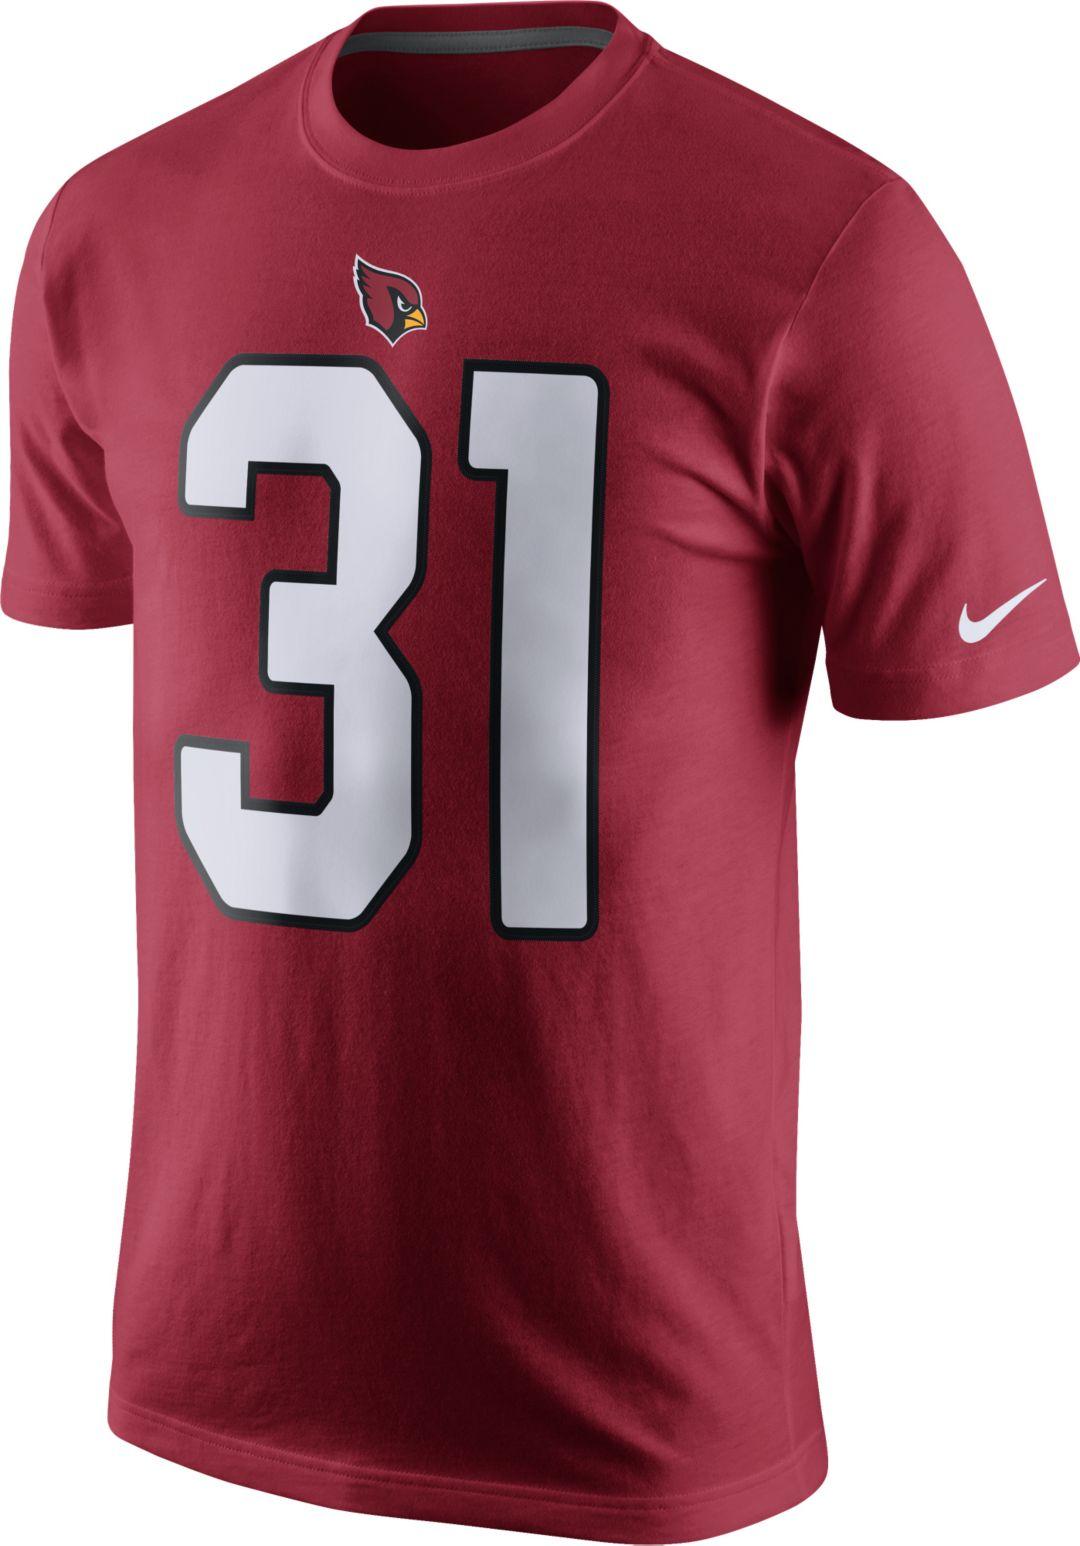 new style 4f43b a16c2 Nike Men's Arizona Cardinals David Johnson #31 Pride Red T-Shirt